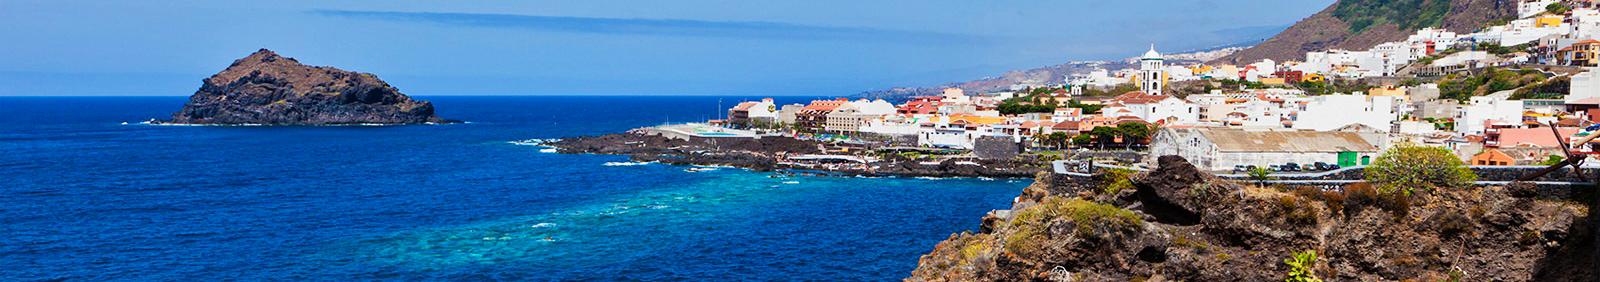 Divemaster-internship-Academy-Tenerife-4 Tenerife, Canary Islands, PADI Divemaster internship